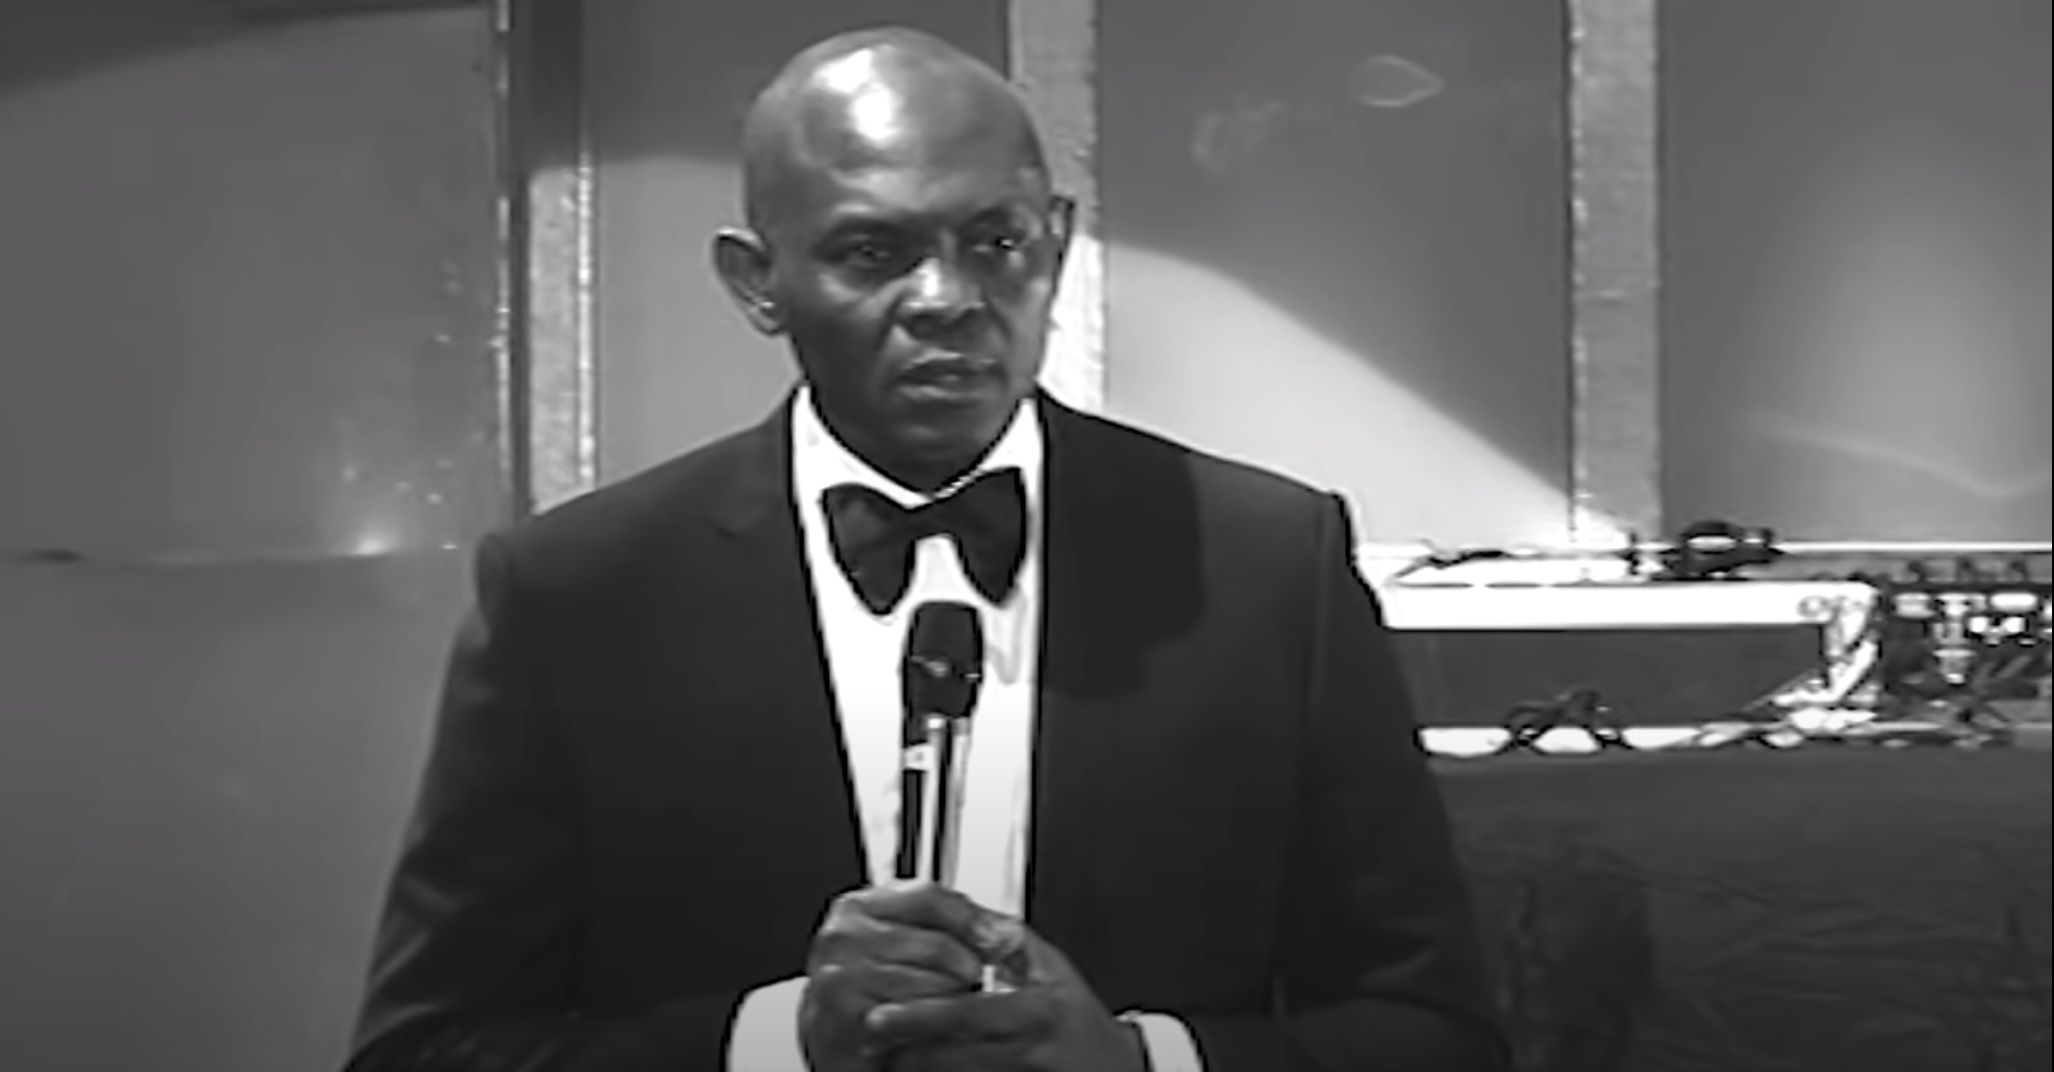 Heirs holdings Chairman, Tony Elumelu announces his retirement from UBA